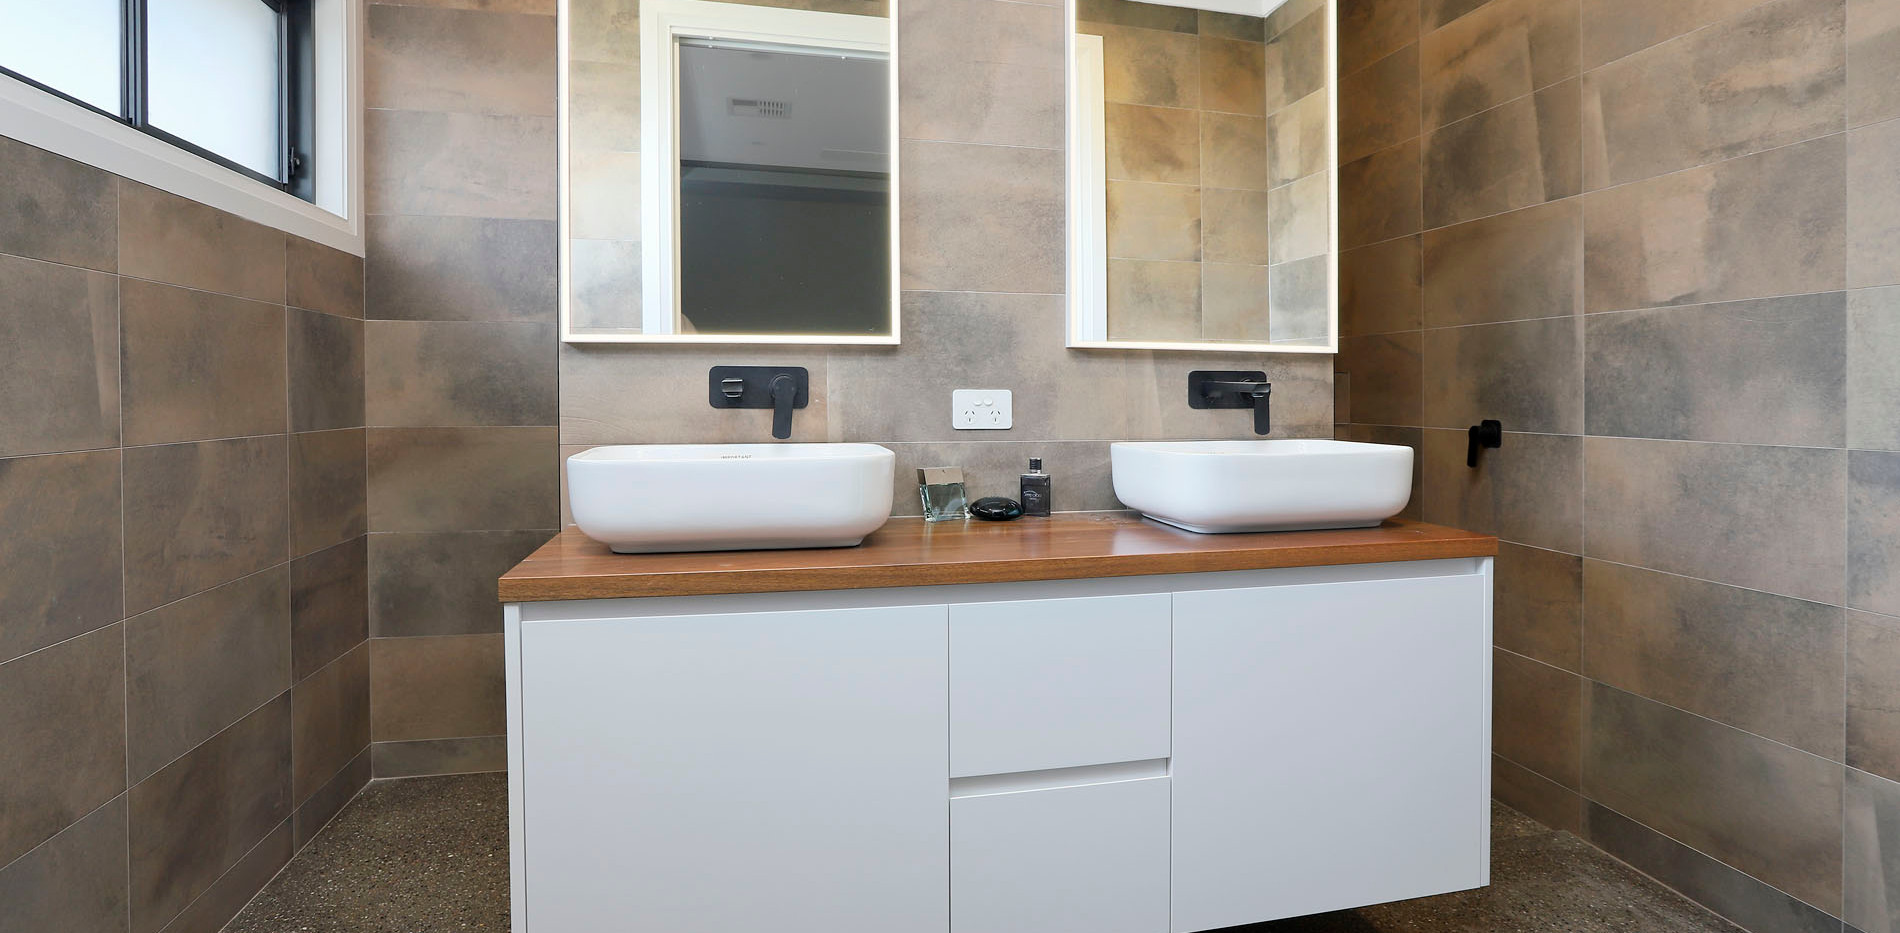 Hawkesbury bathrooms and Kitchens (48)